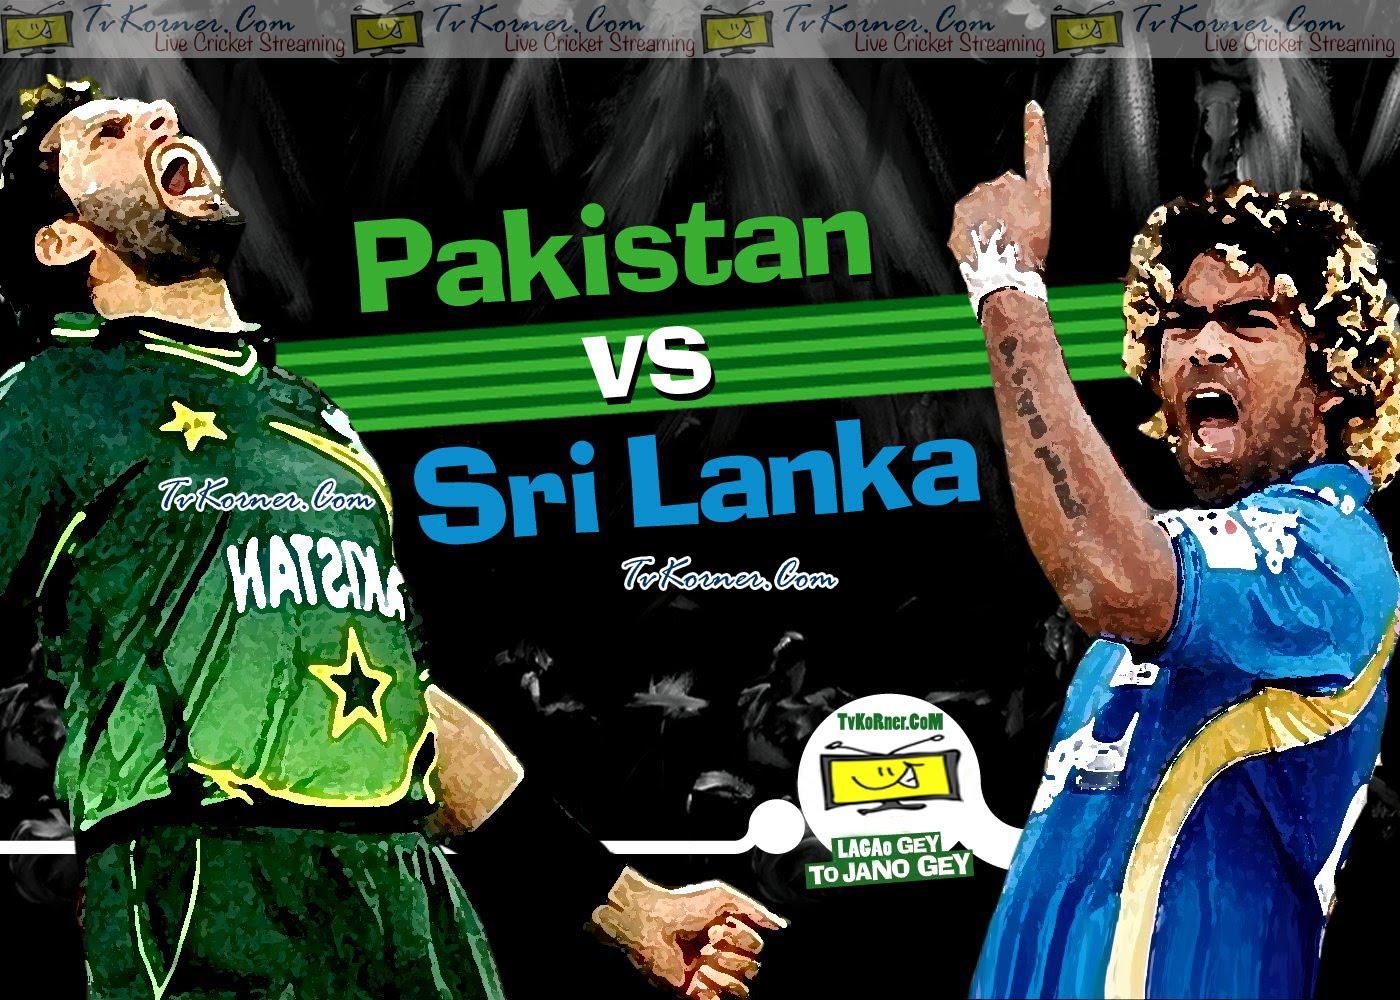 sri lanka vs pakistan - photo #8